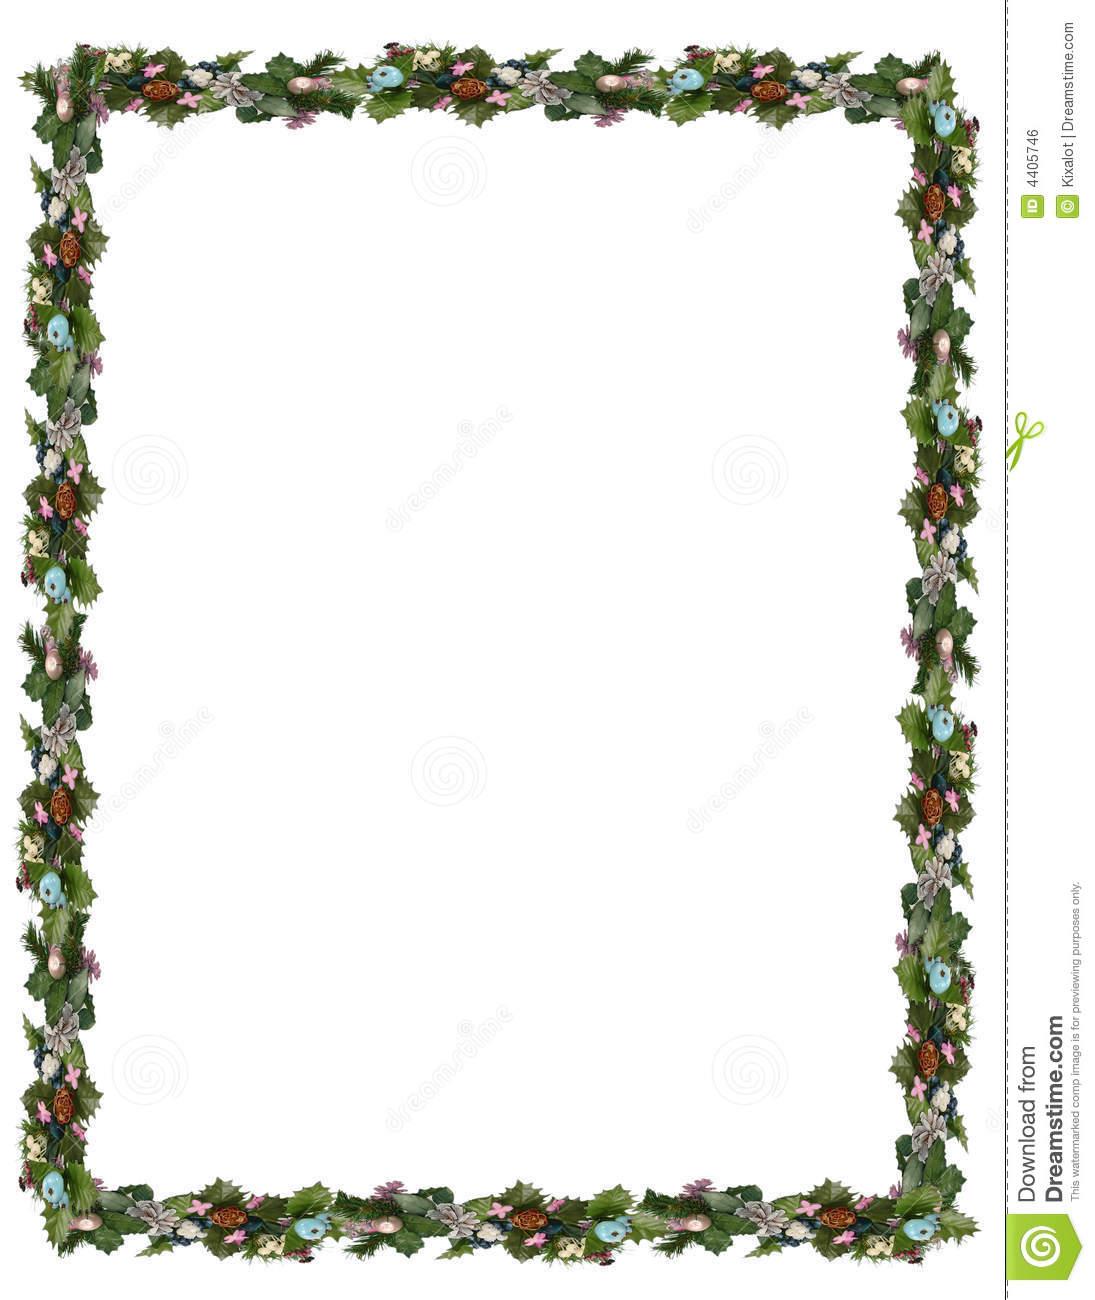 1095x1300 Winter Holiday Christmas Wreath Border Merry Christmas Amp Happy